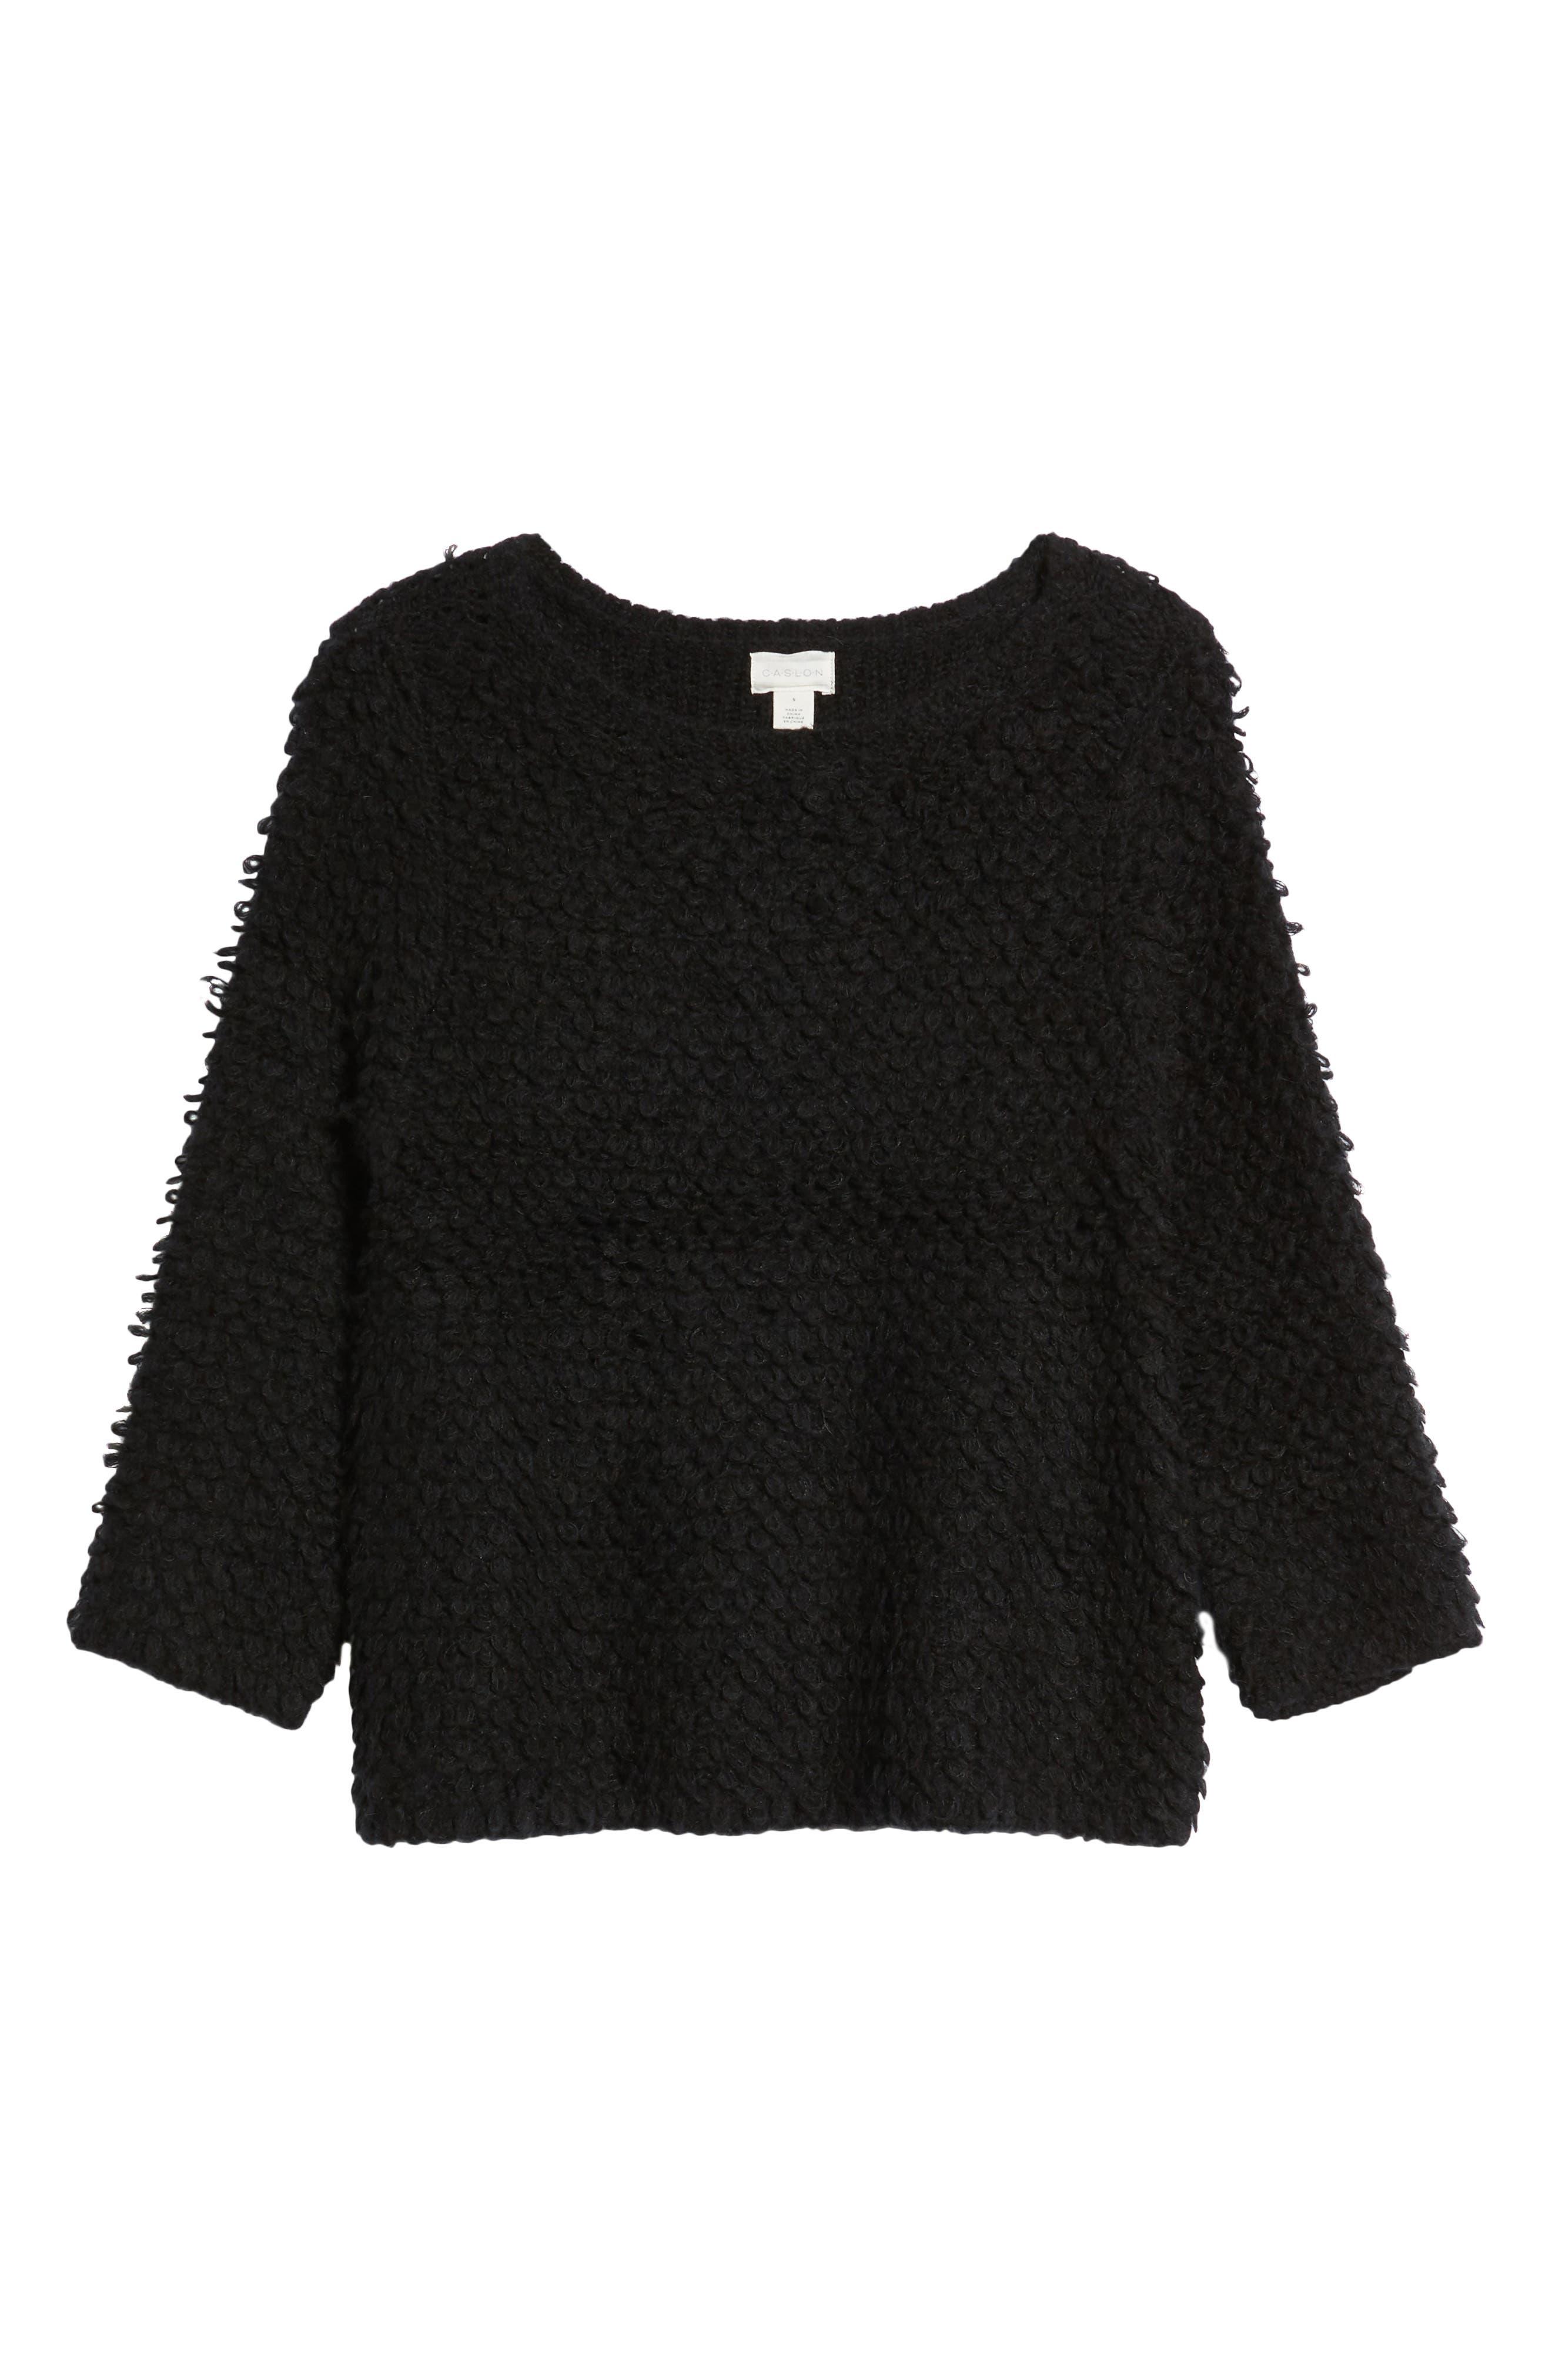 Loop Stitch Crewneck Sweater,                             Alternate thumbnail 6, color,                             Black